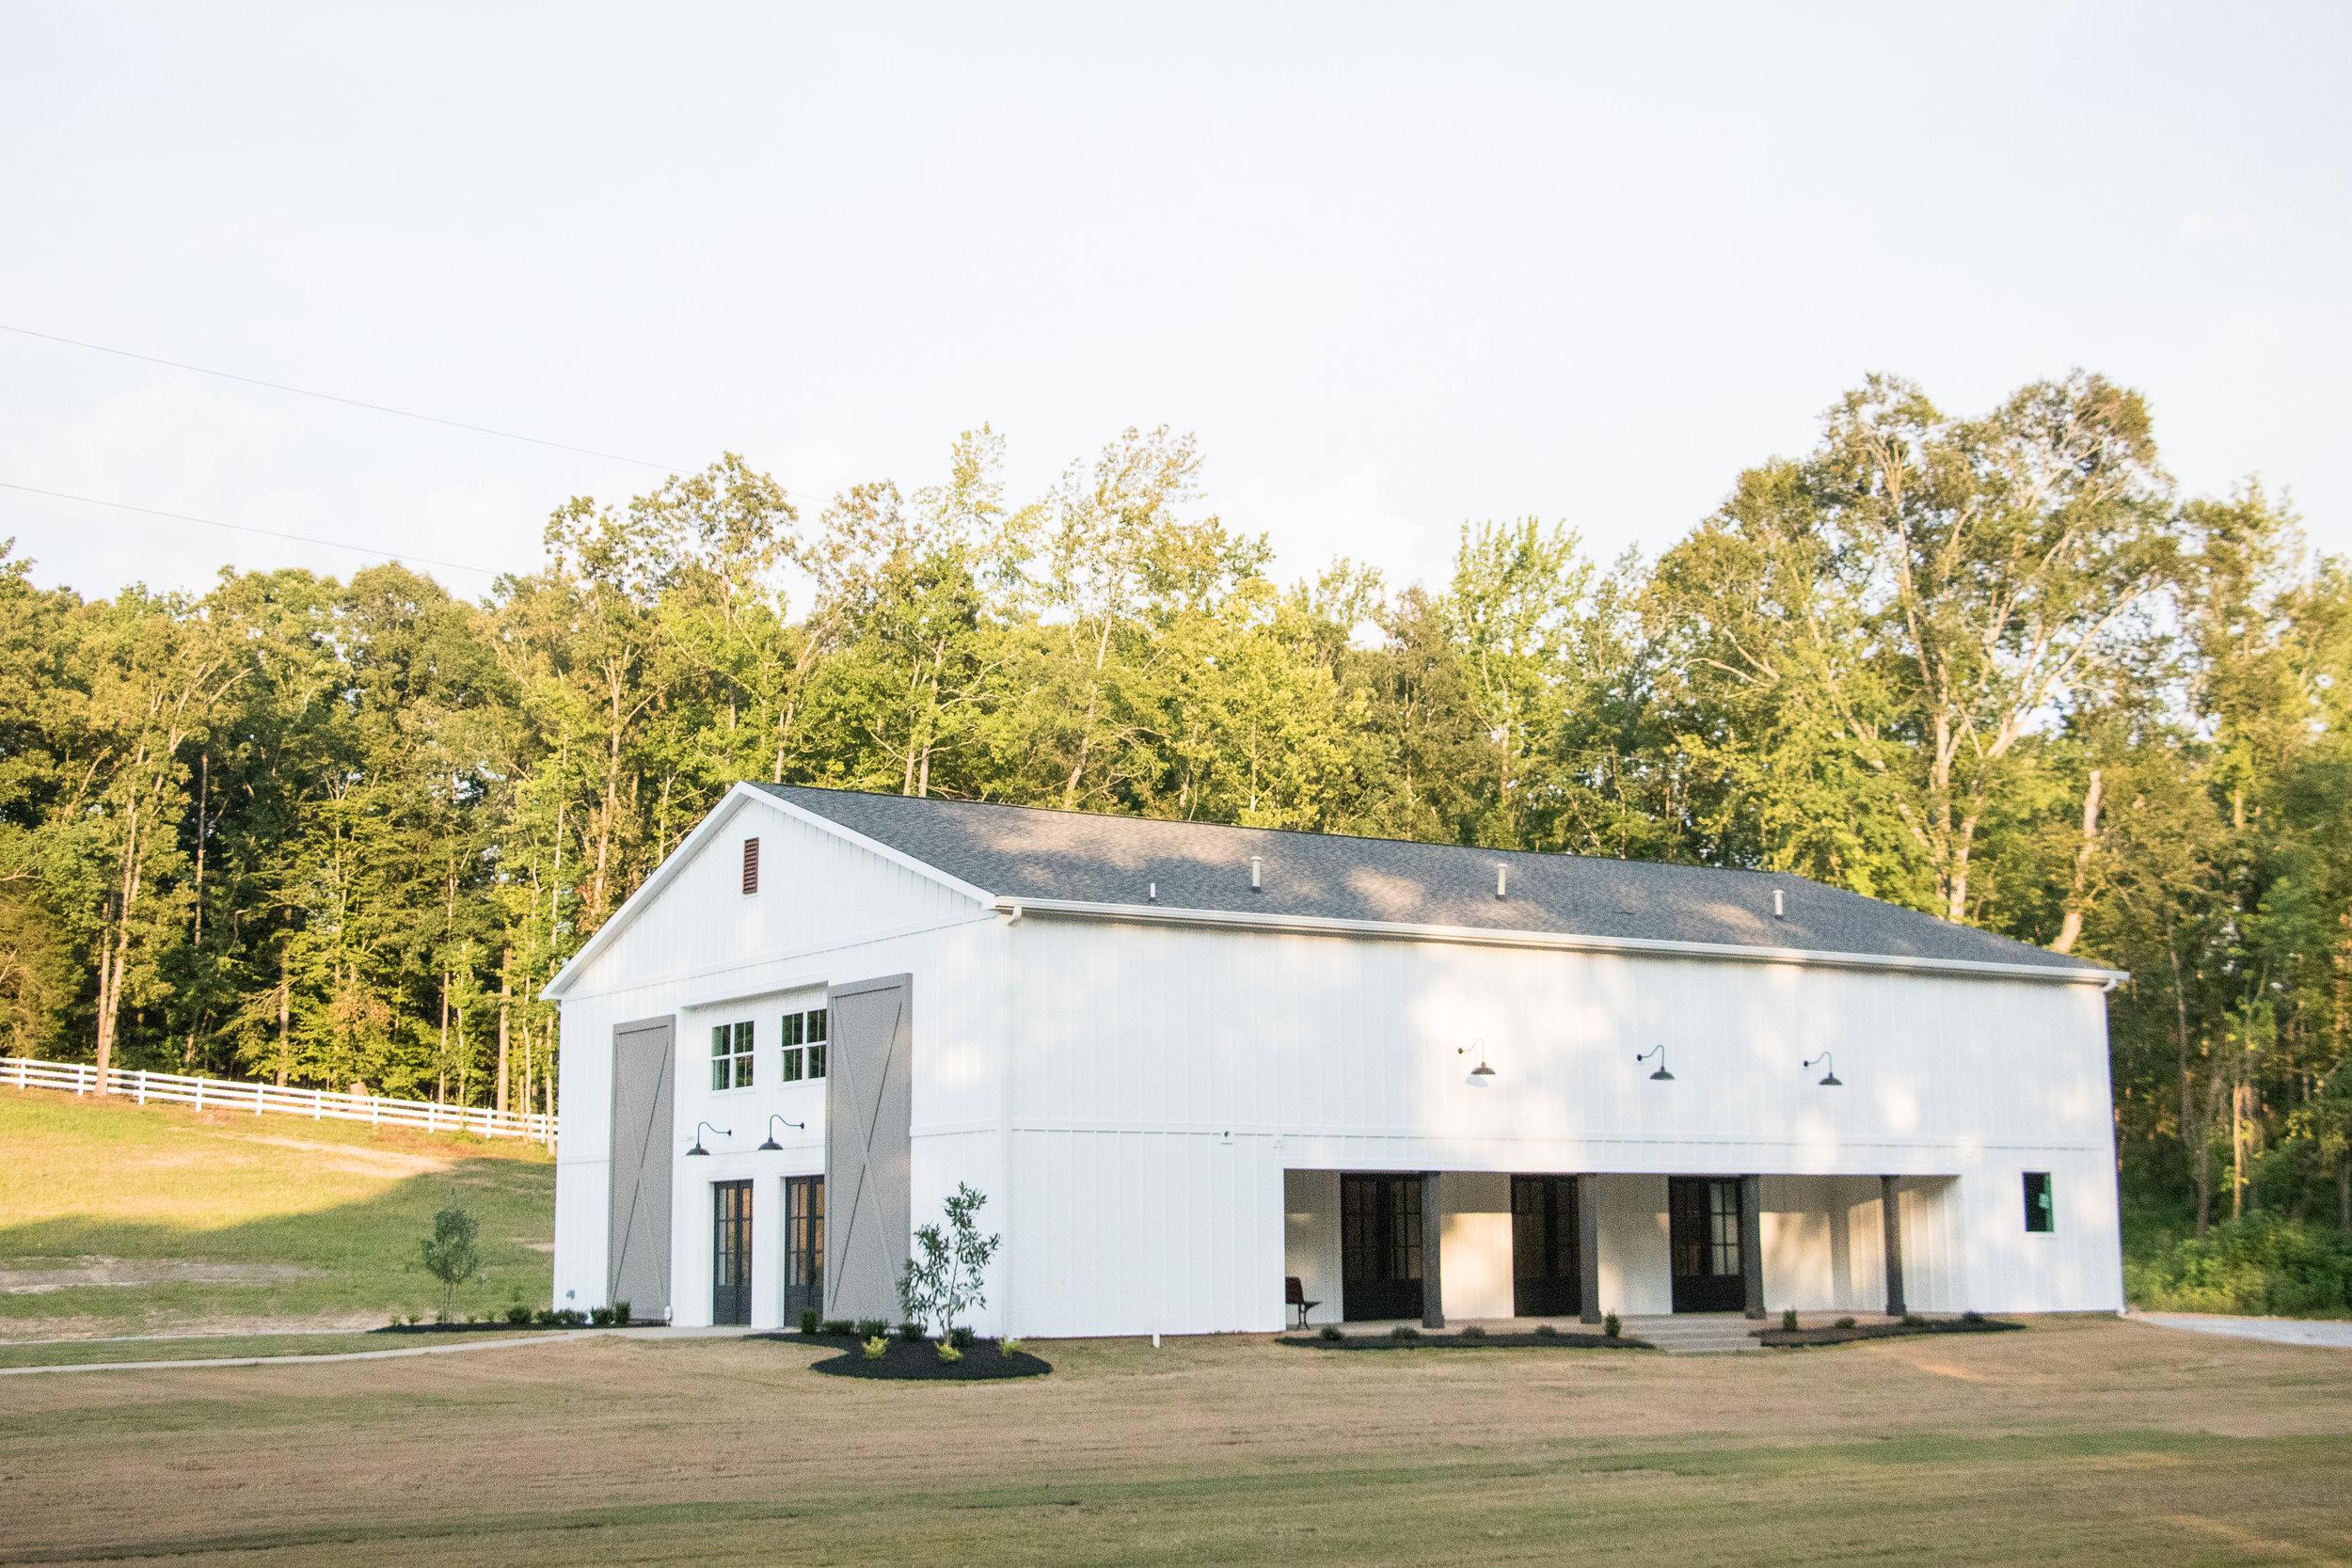 The Venue at White Oak Farms, established 2017